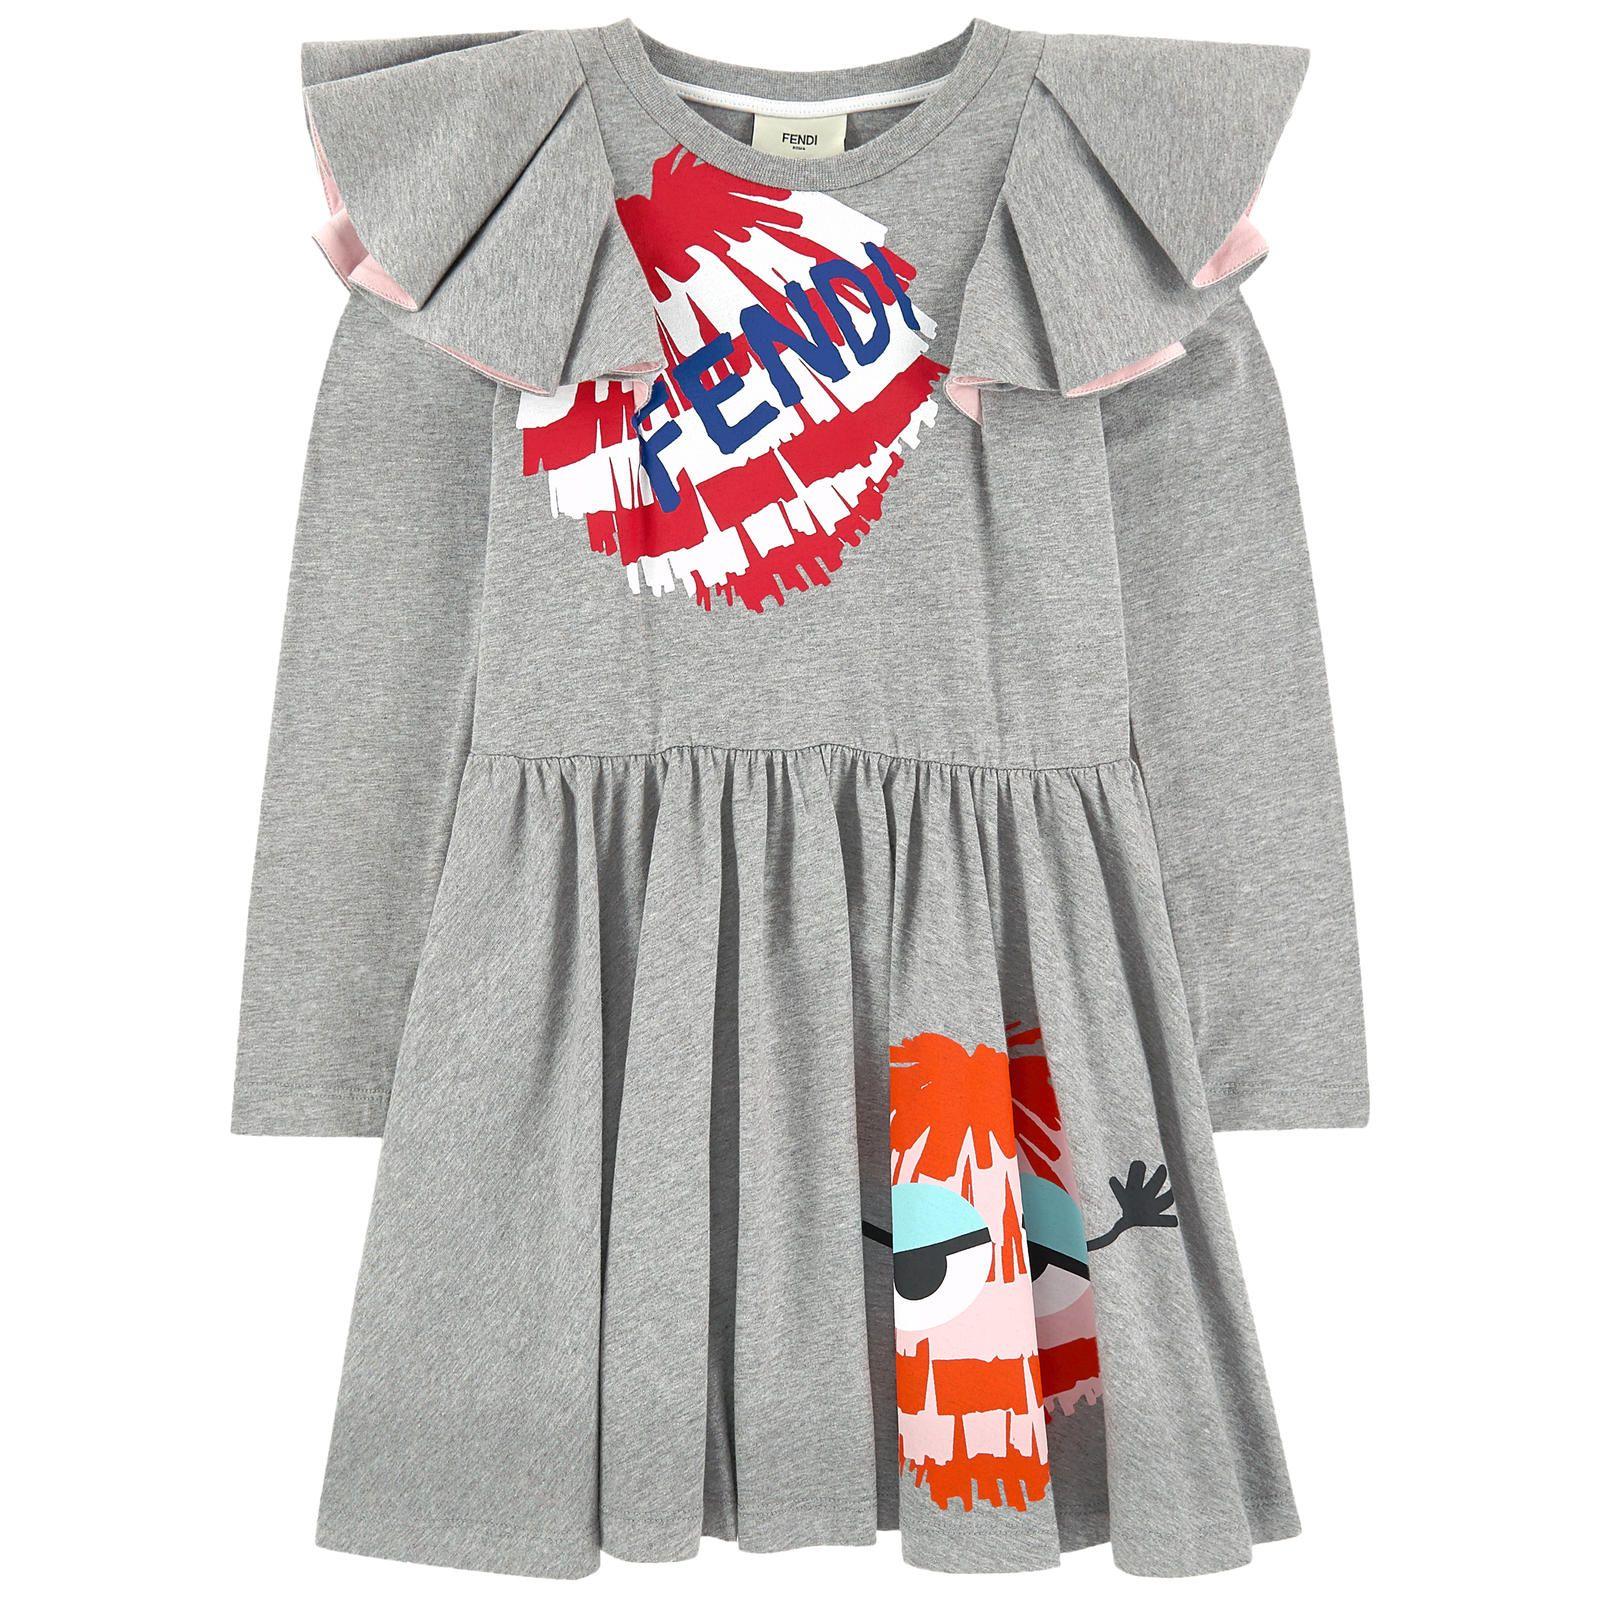 Dress With Flounces Jersey Dress Fashion Clothes Design